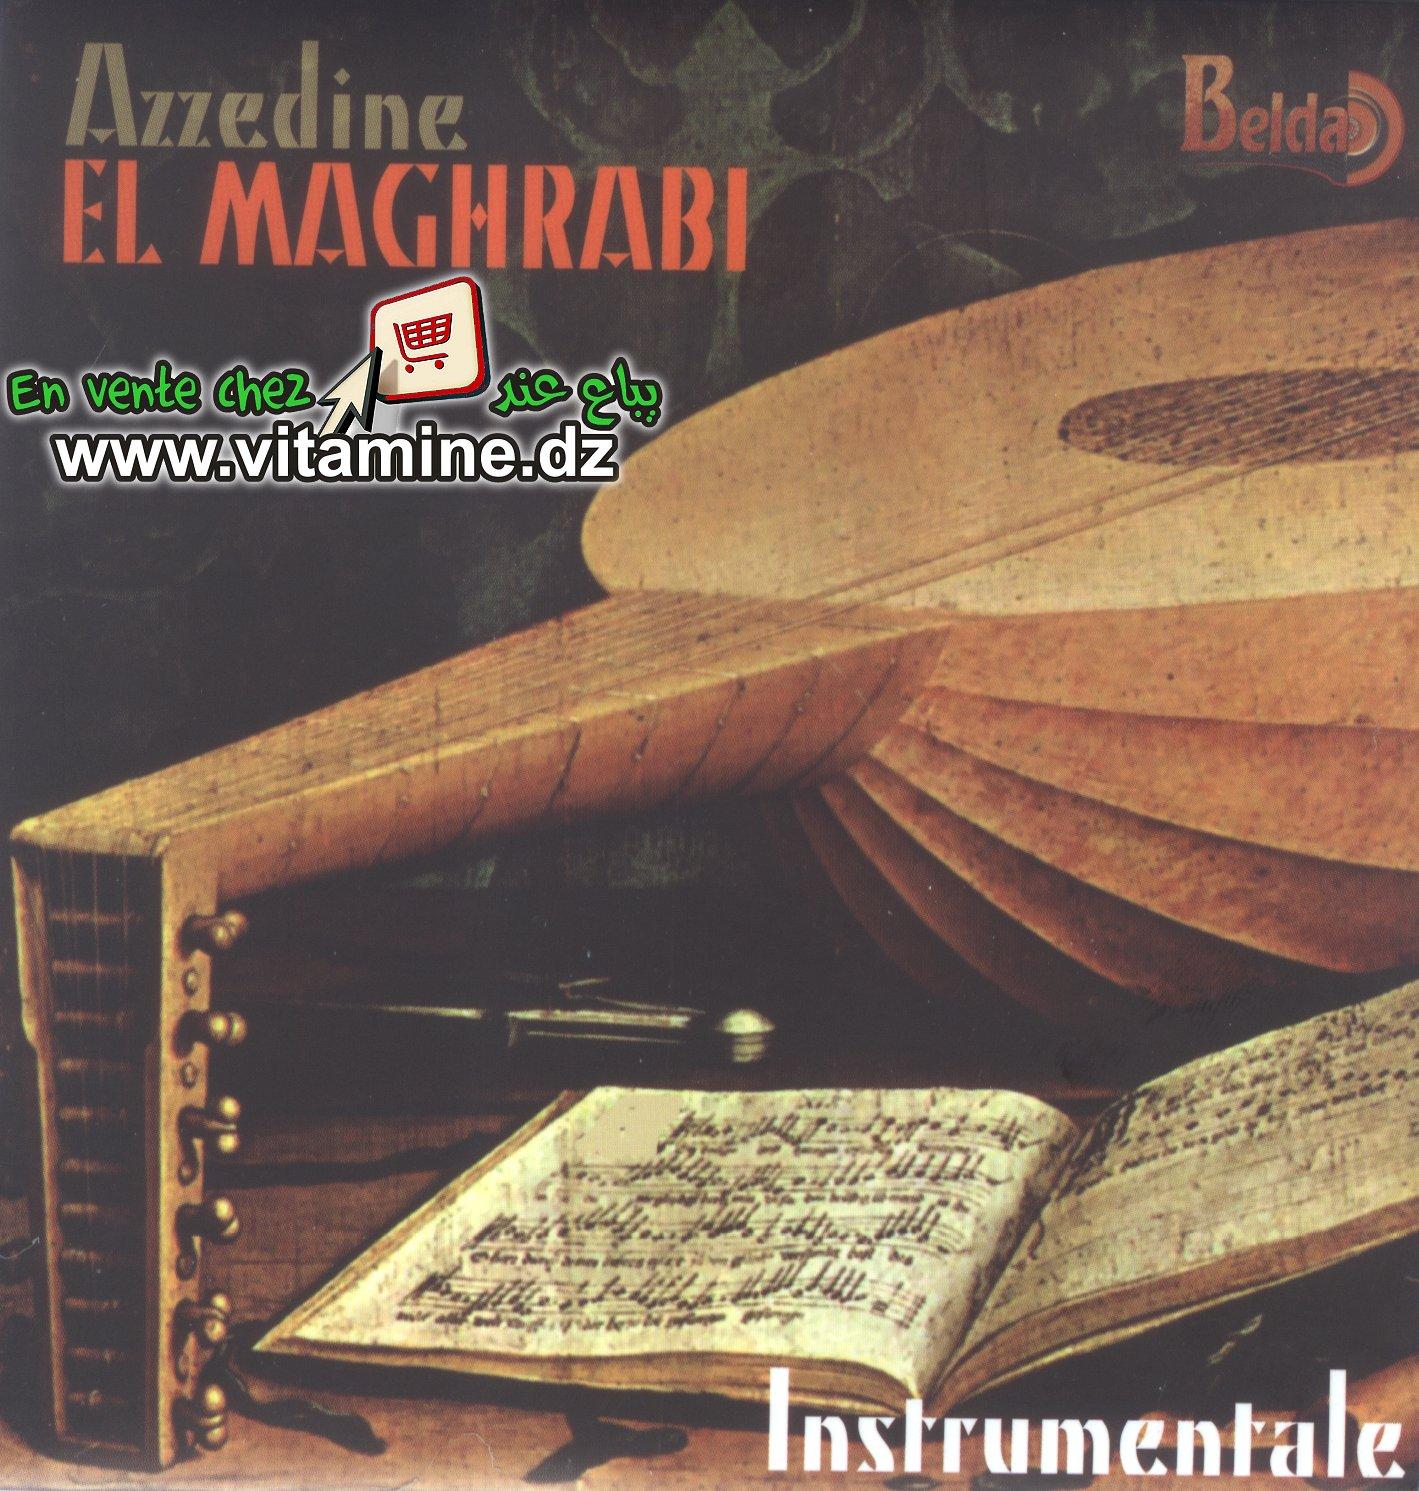 Azzedine El Maghrabi